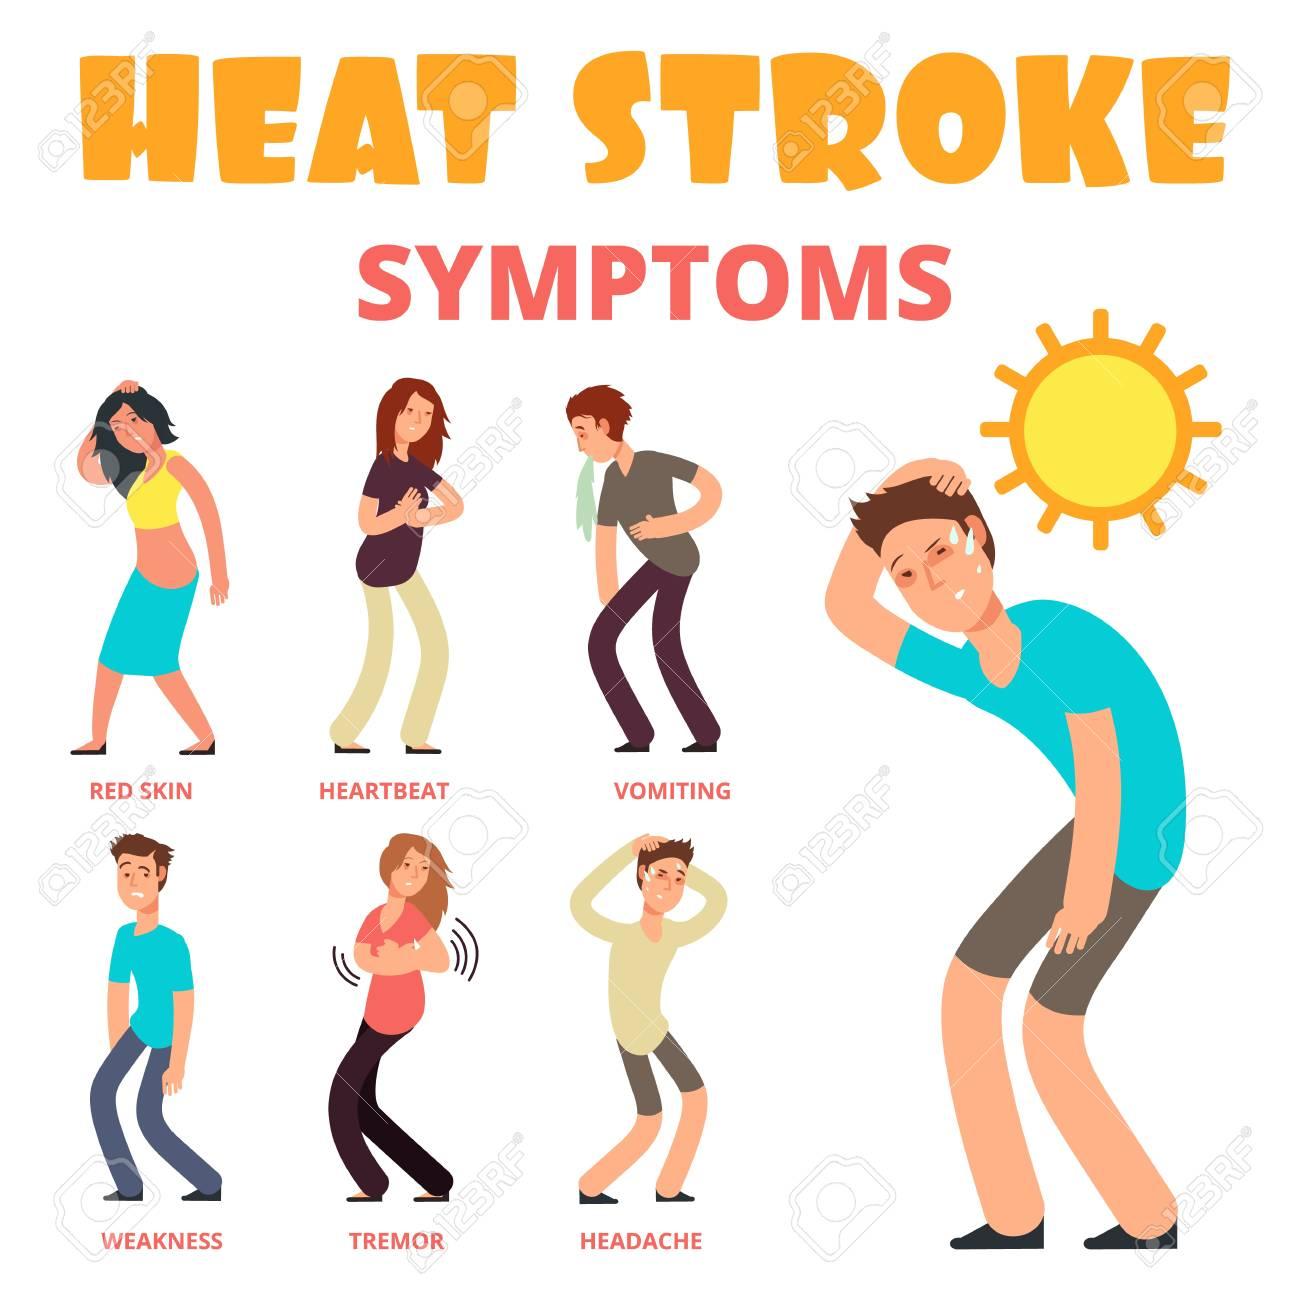 Heat stroke symptoms cartoon vector poster, Illustration of hot stroke summer, sunstroke and heatstroke symptom - 109645321